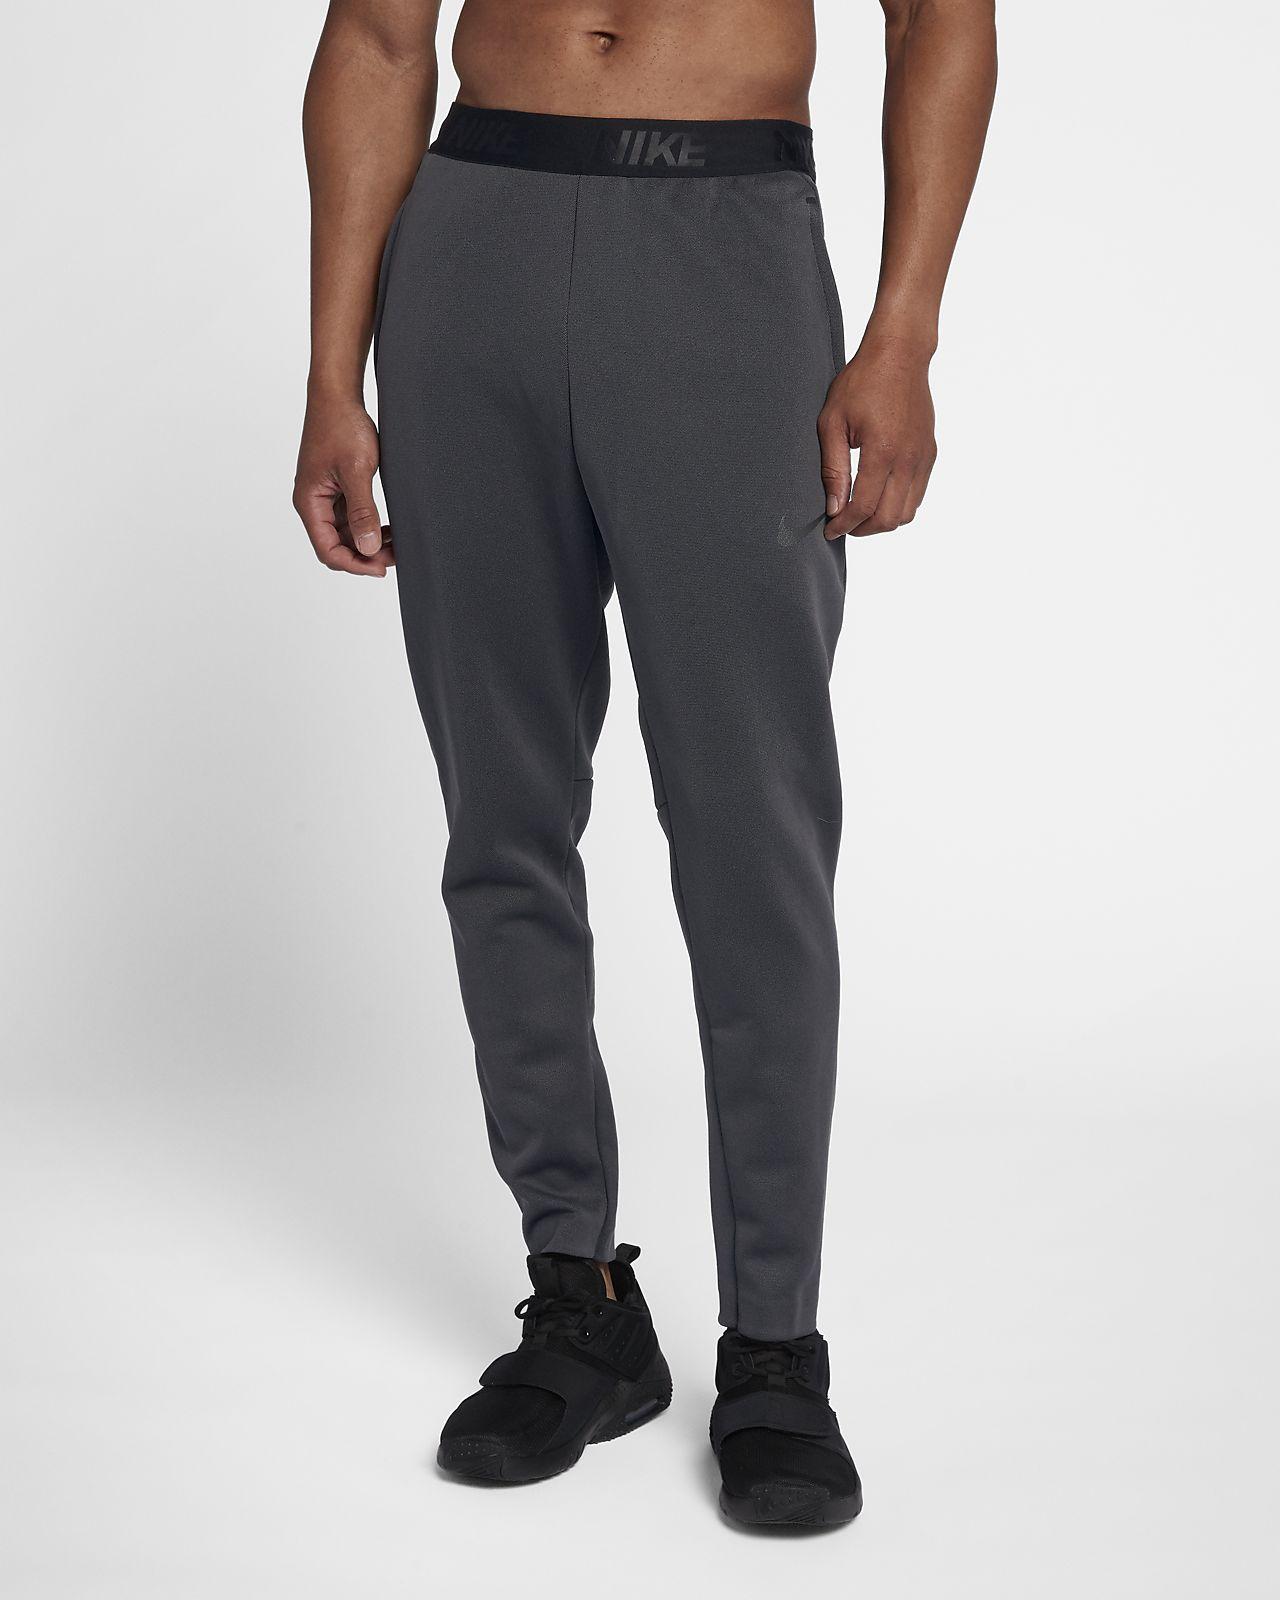 pantalon therma sphere nike